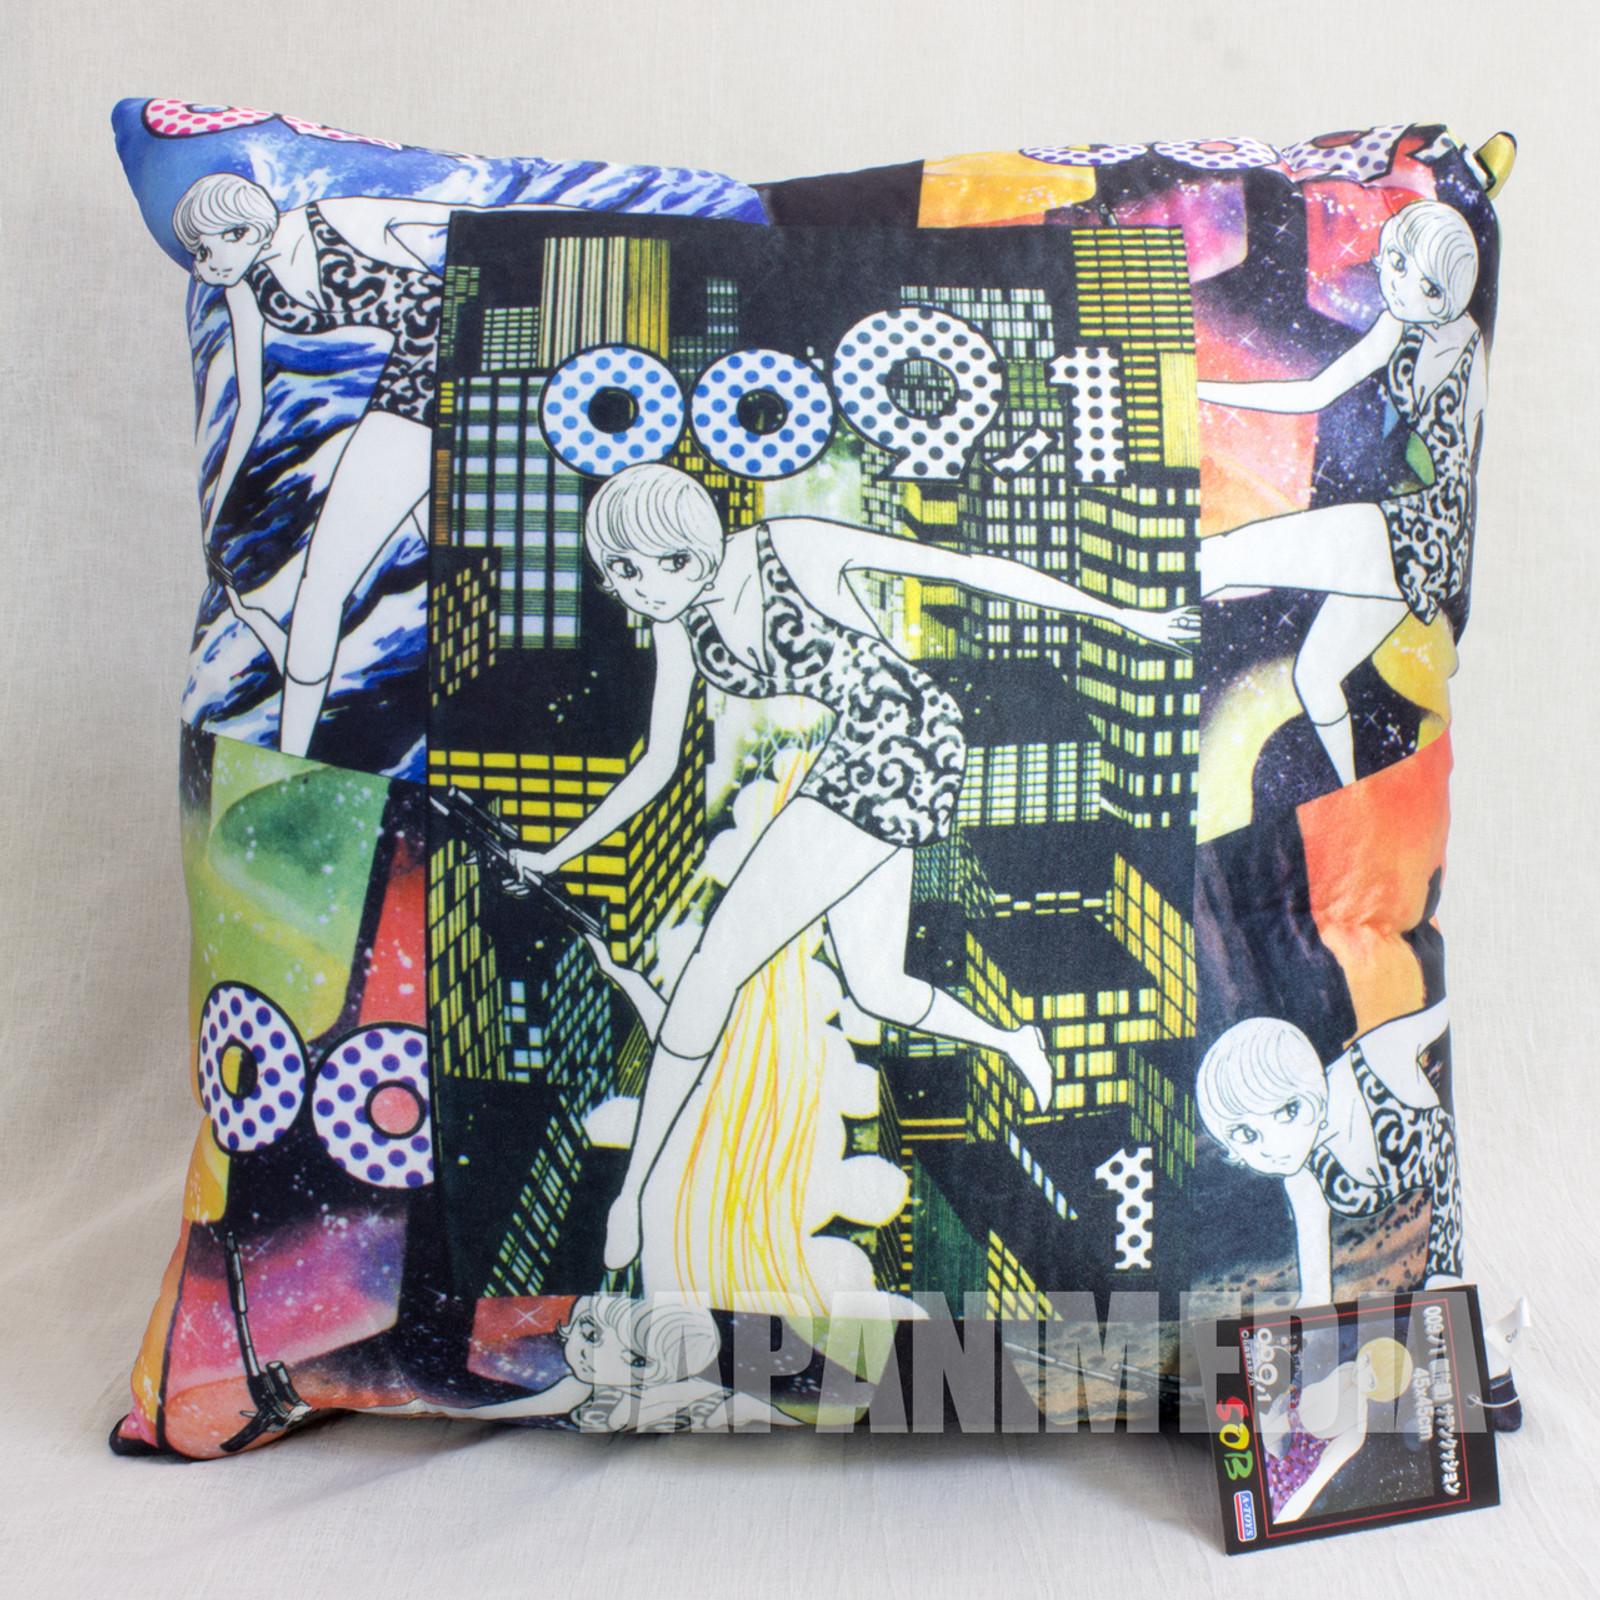 009-1 Mylene Hoffman Satin Cushion 45x45cm #3 JAPAN ANIME CYBORG ISHINOMORI